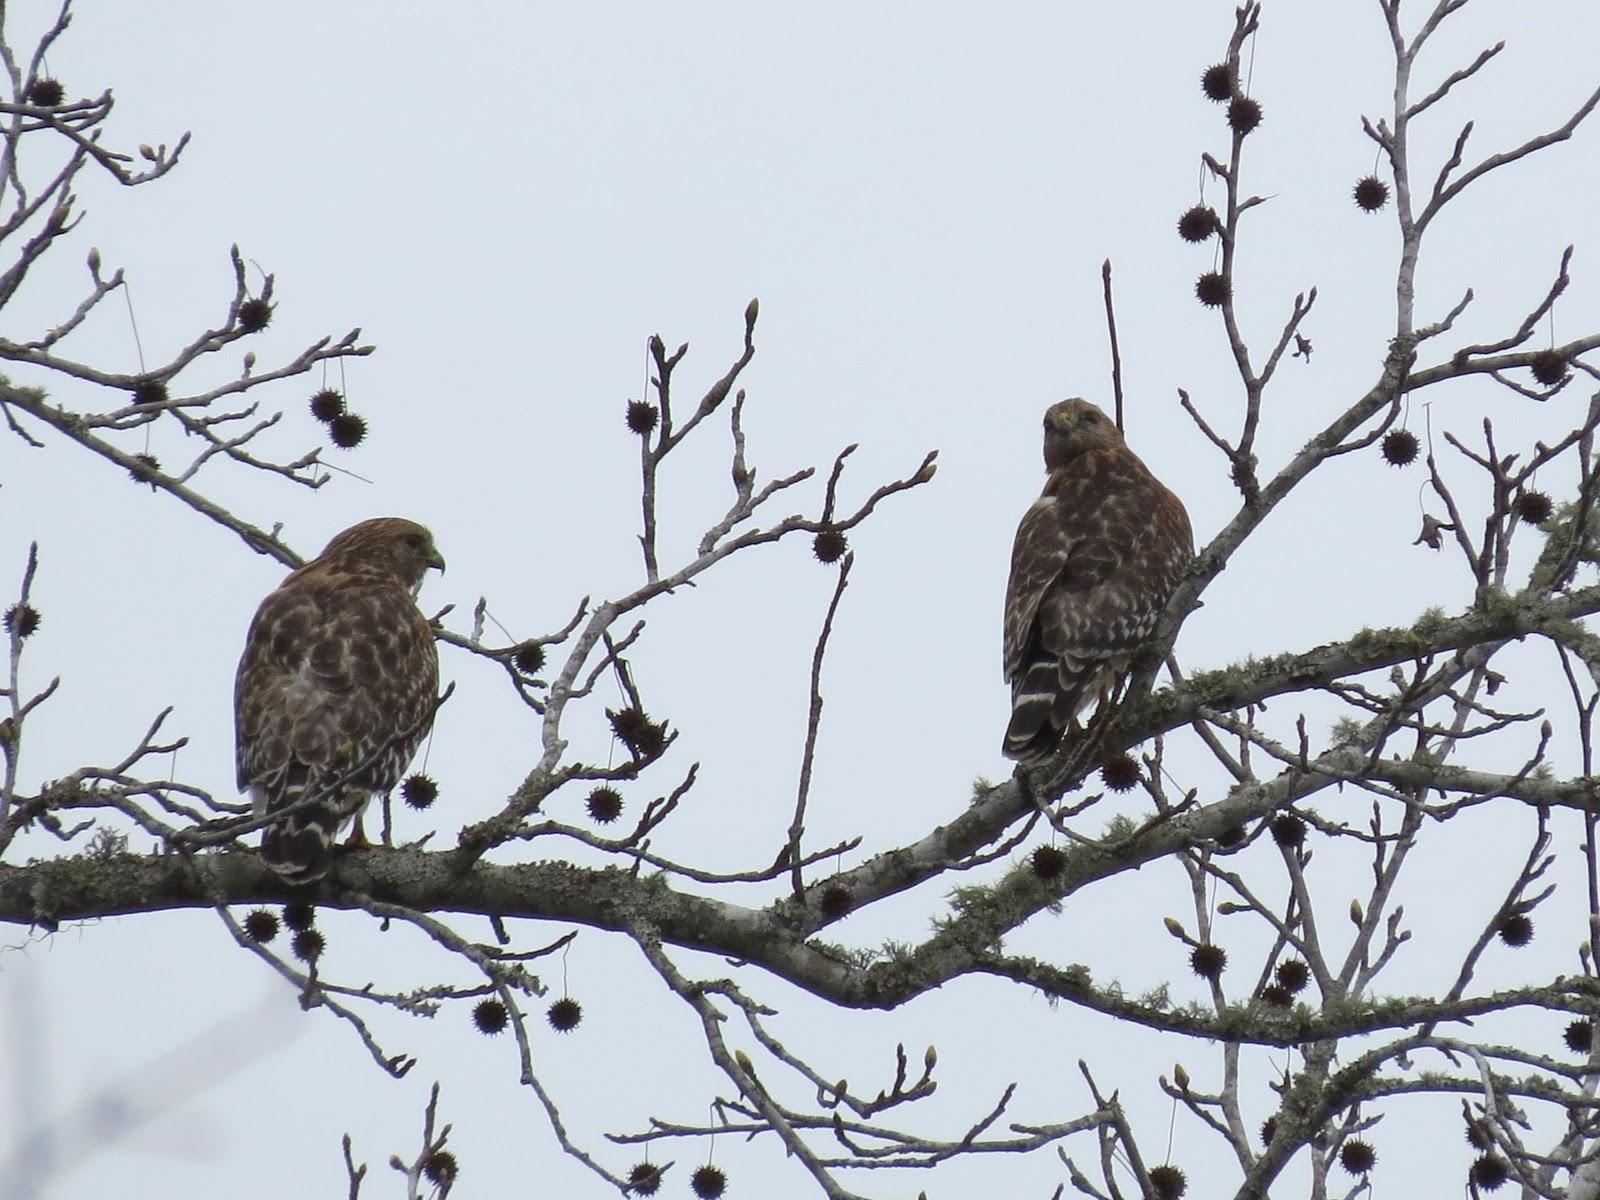 Winter Backyard Birds : ll add more winter backyard birds as I see them and photograph them